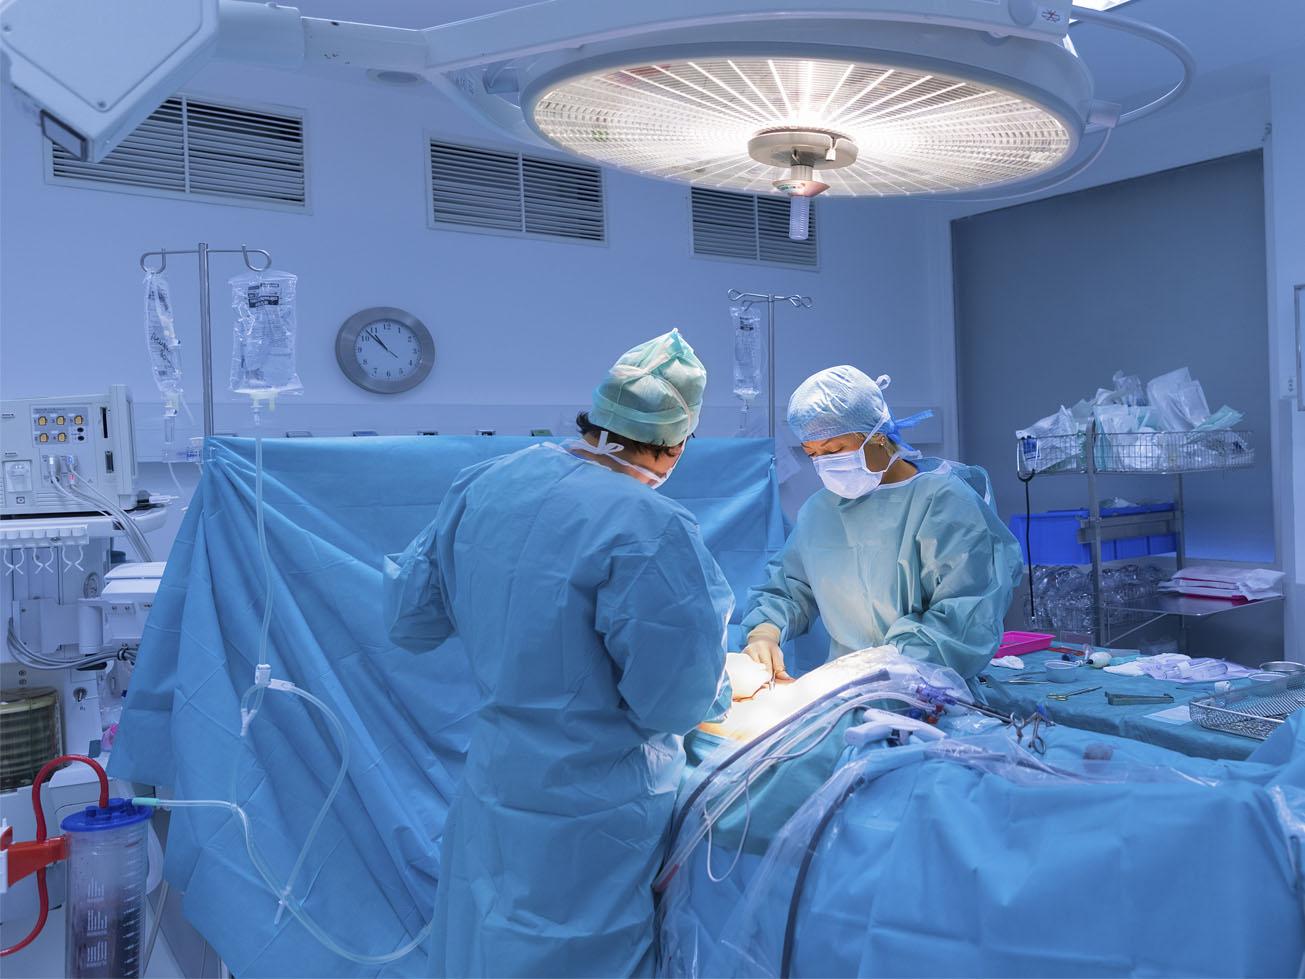 service_surgery-general